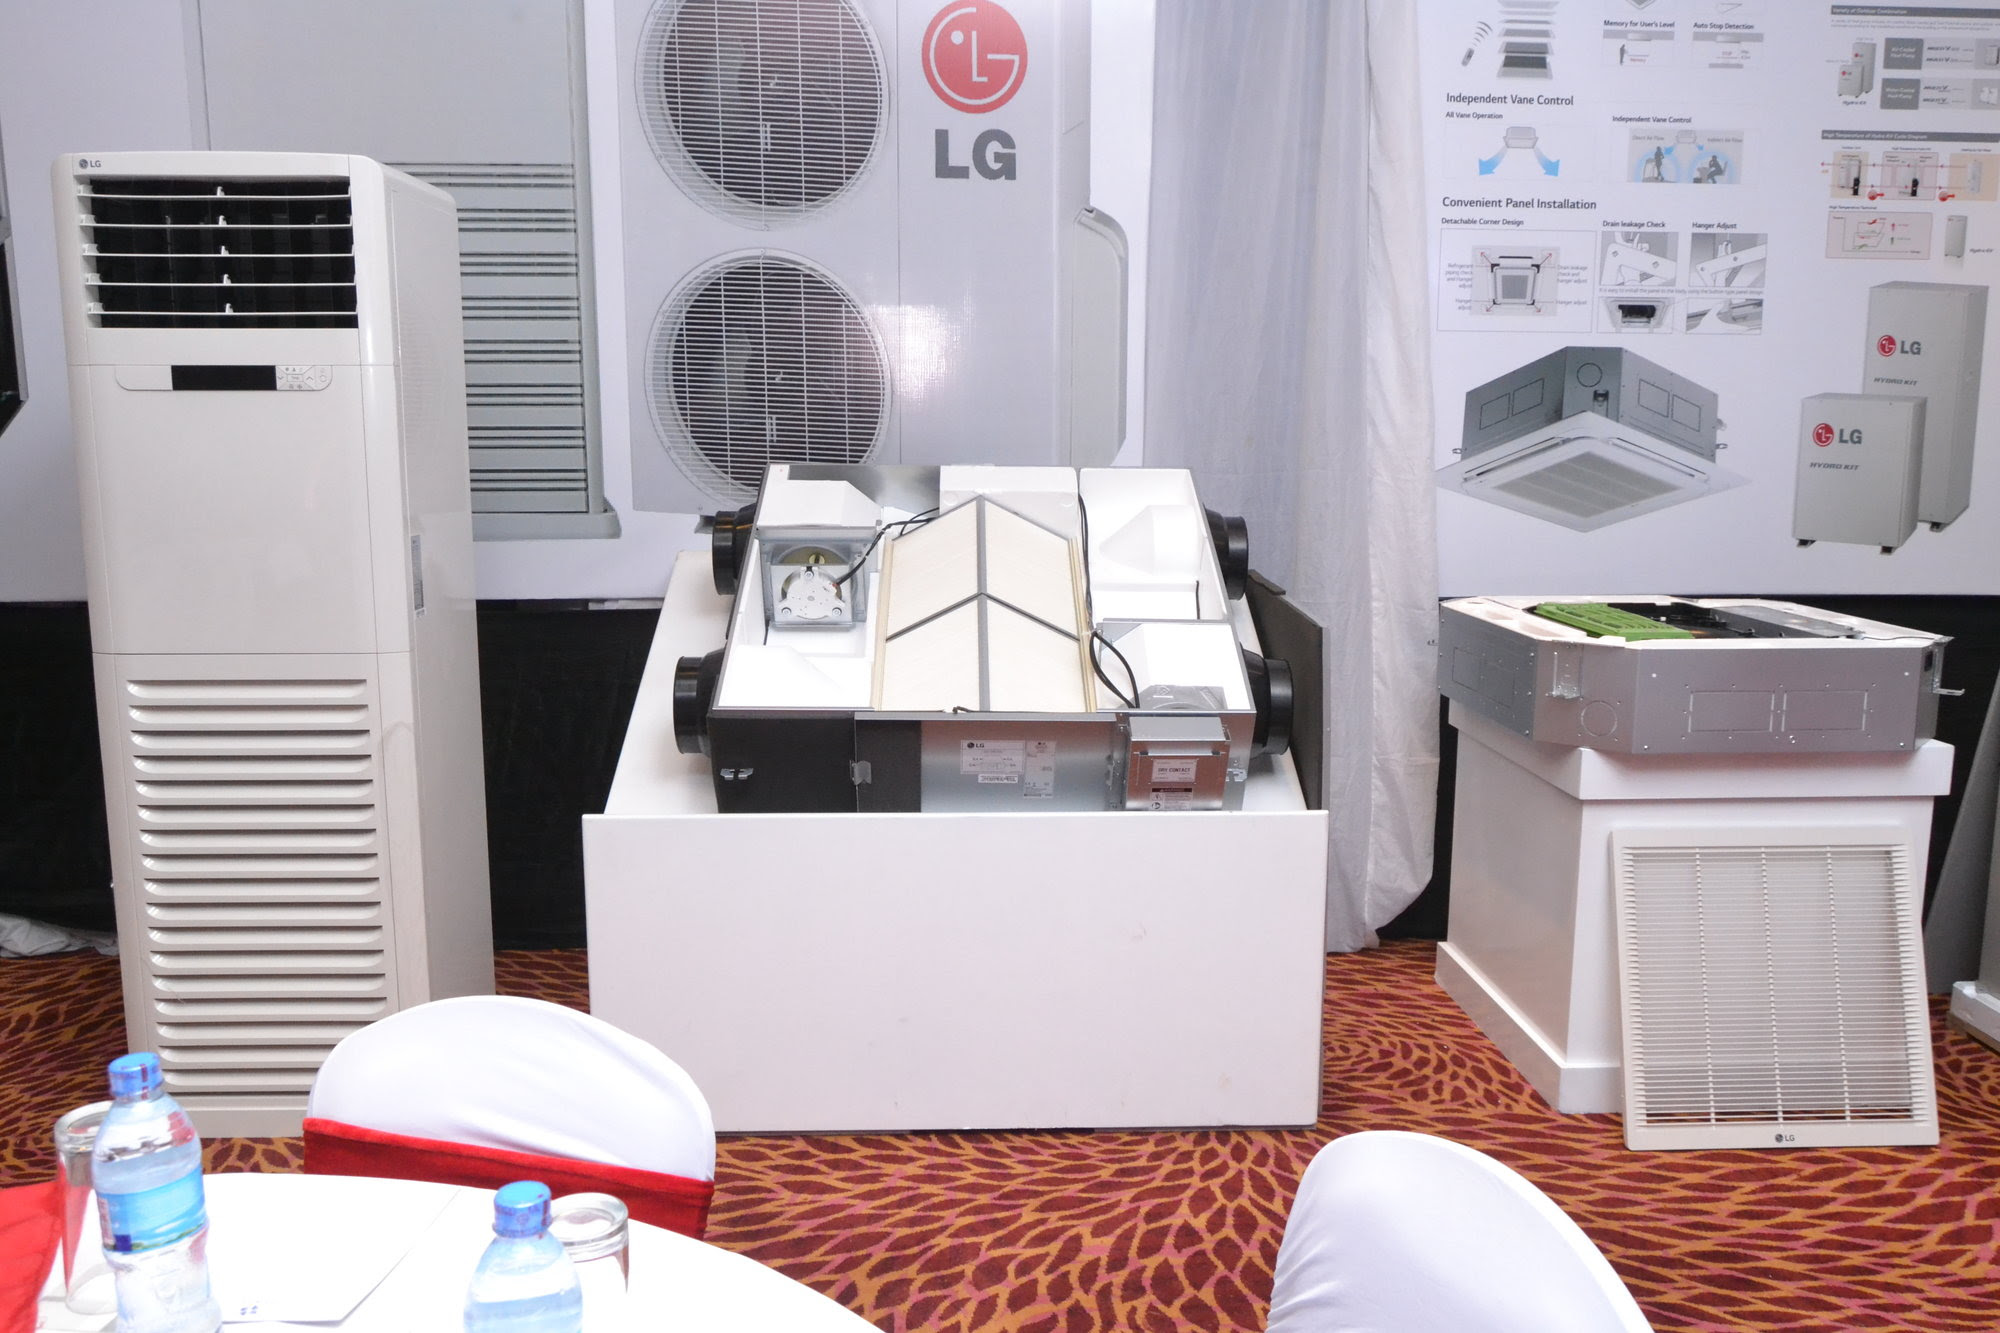 LG Event Photo 9.jpg